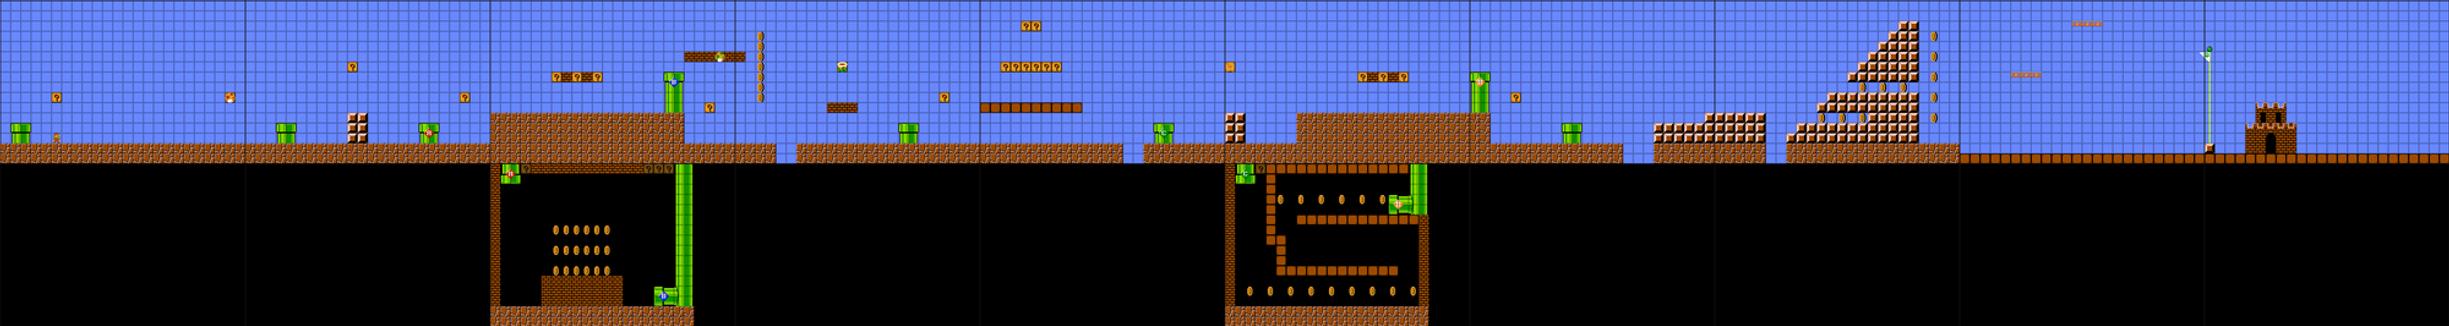 Squishy Super Mario Maker 1 : Super Mario Land 1-1 in Super Mario Maker by Twytchums on DeviantArt